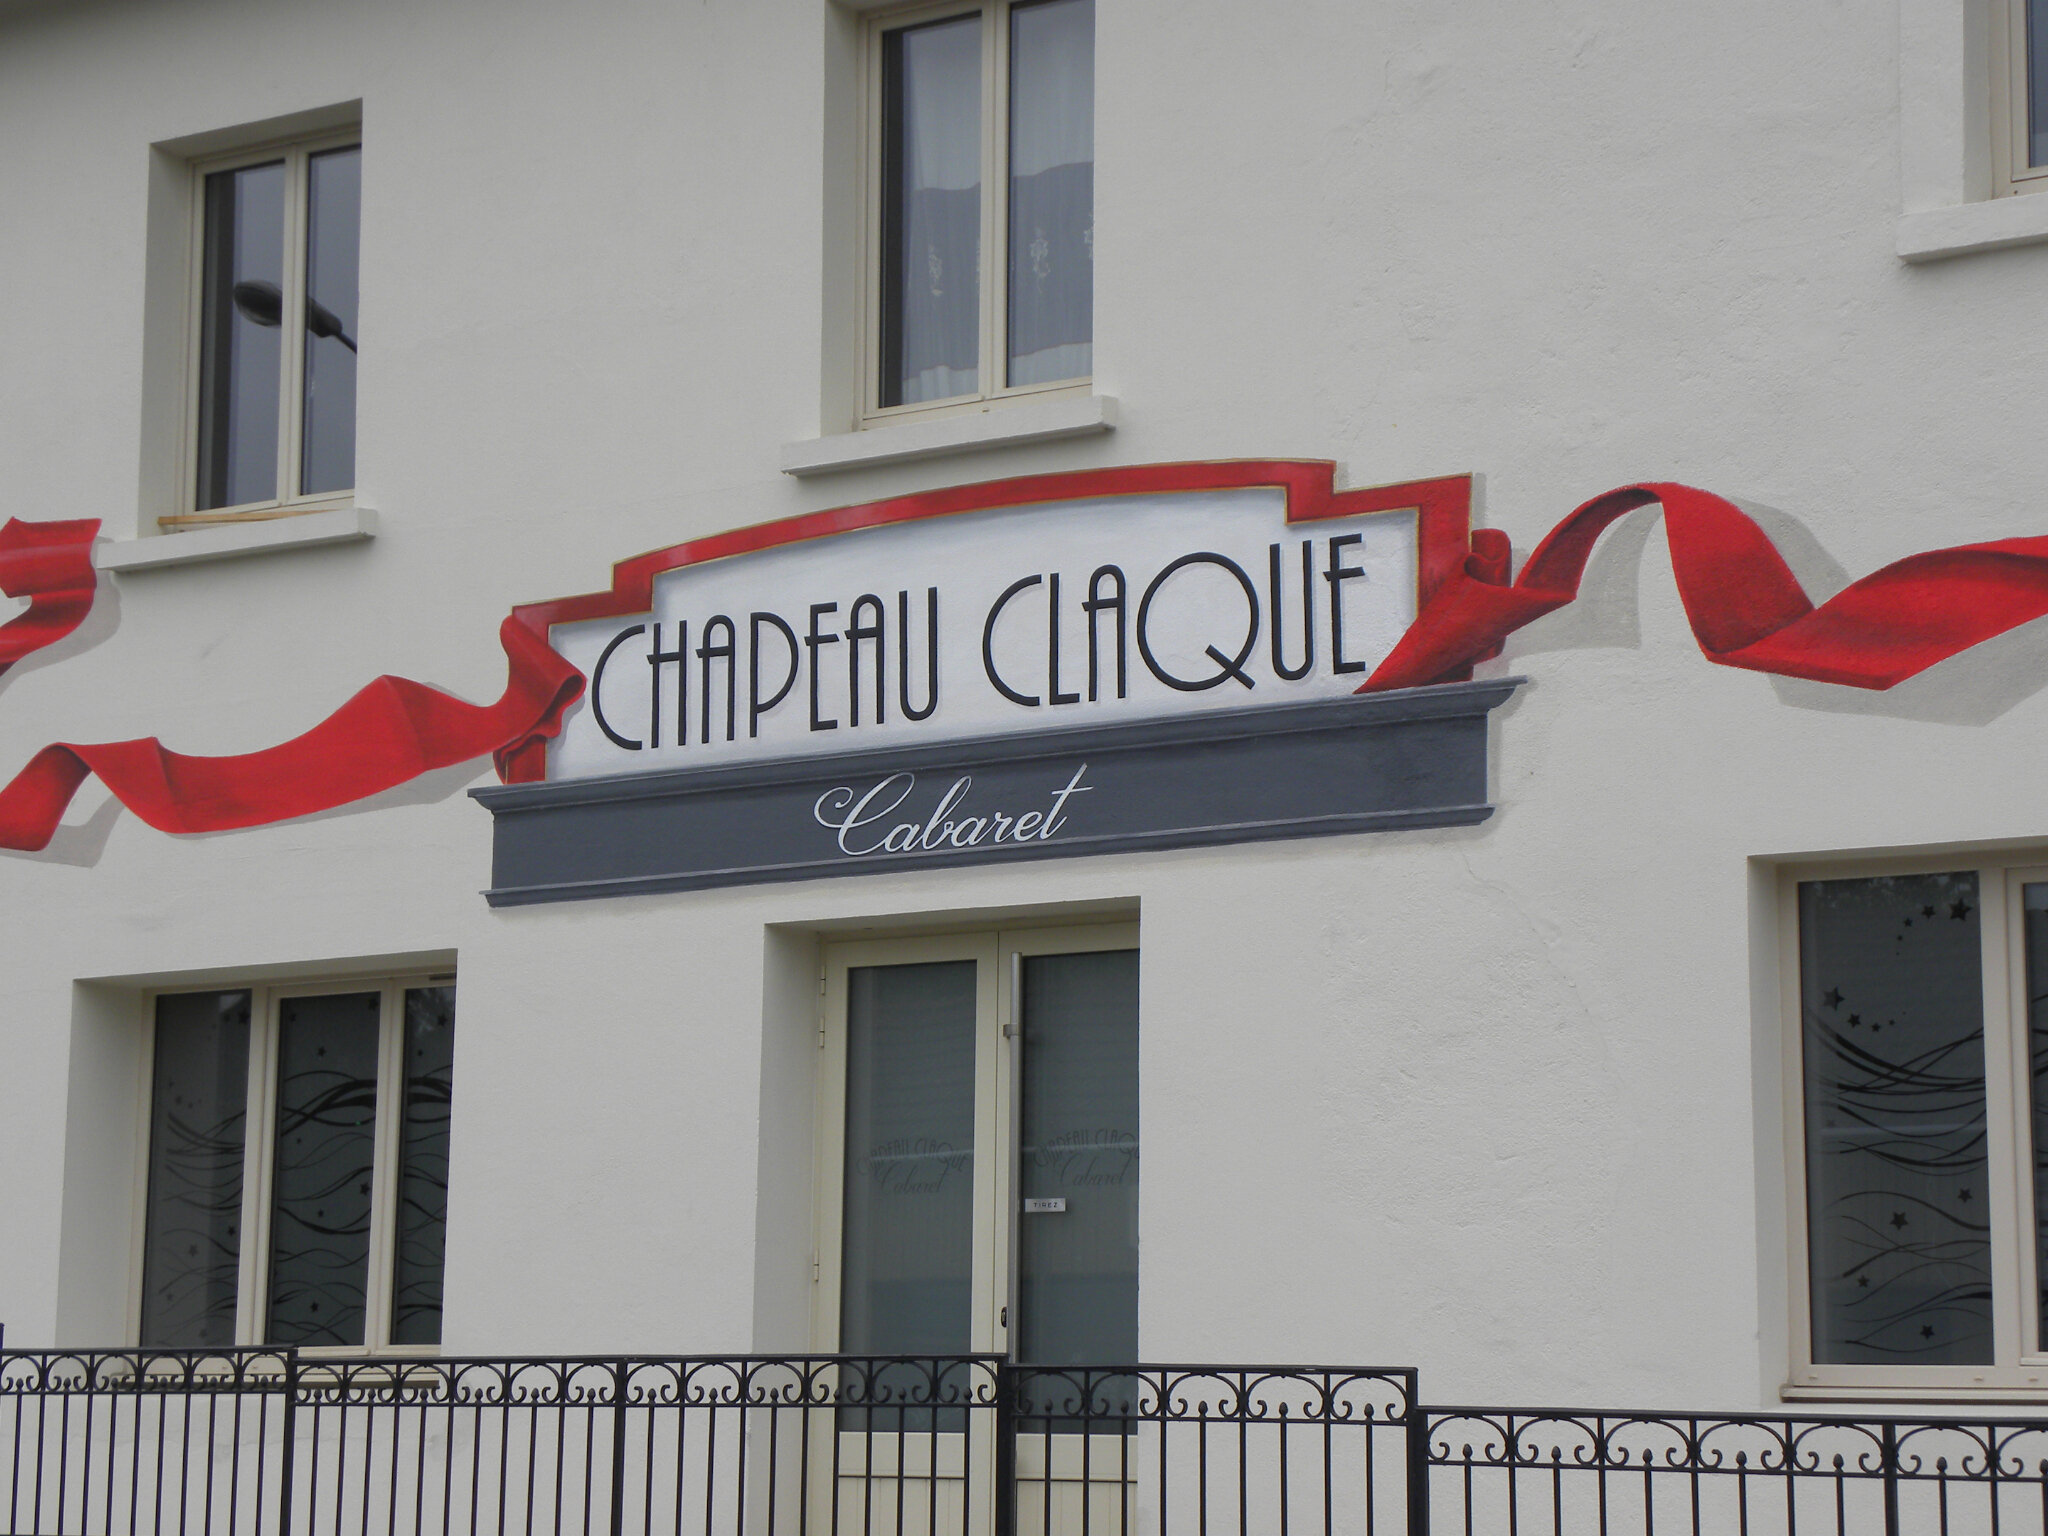 2018-04-28 Chapeau claque 02